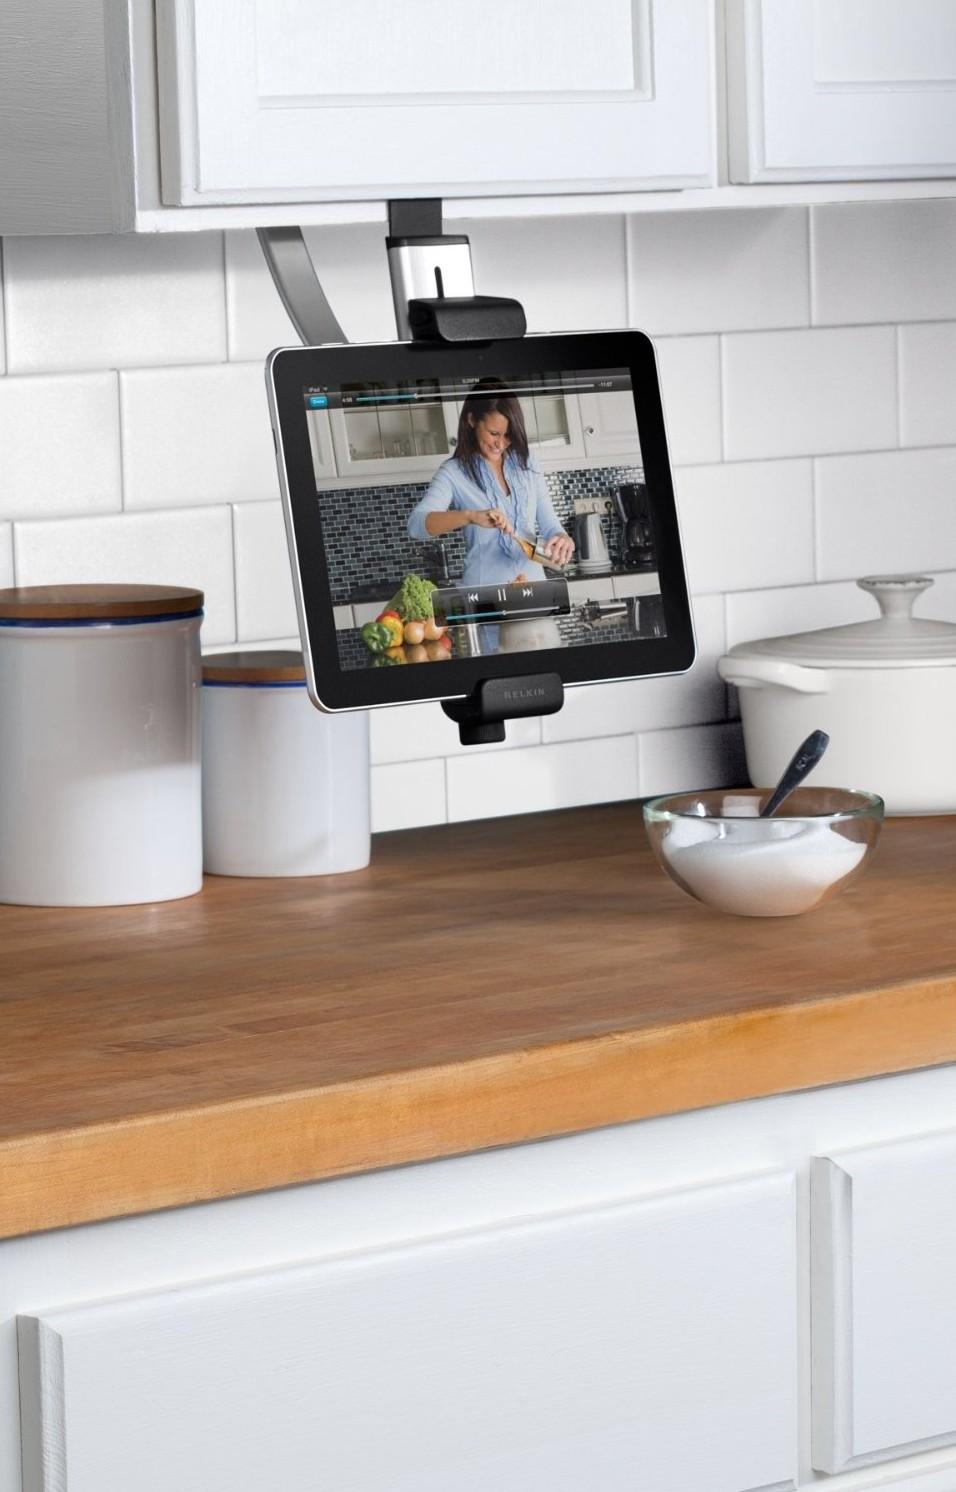 belkin-tablet mount-edgewood cabinetry